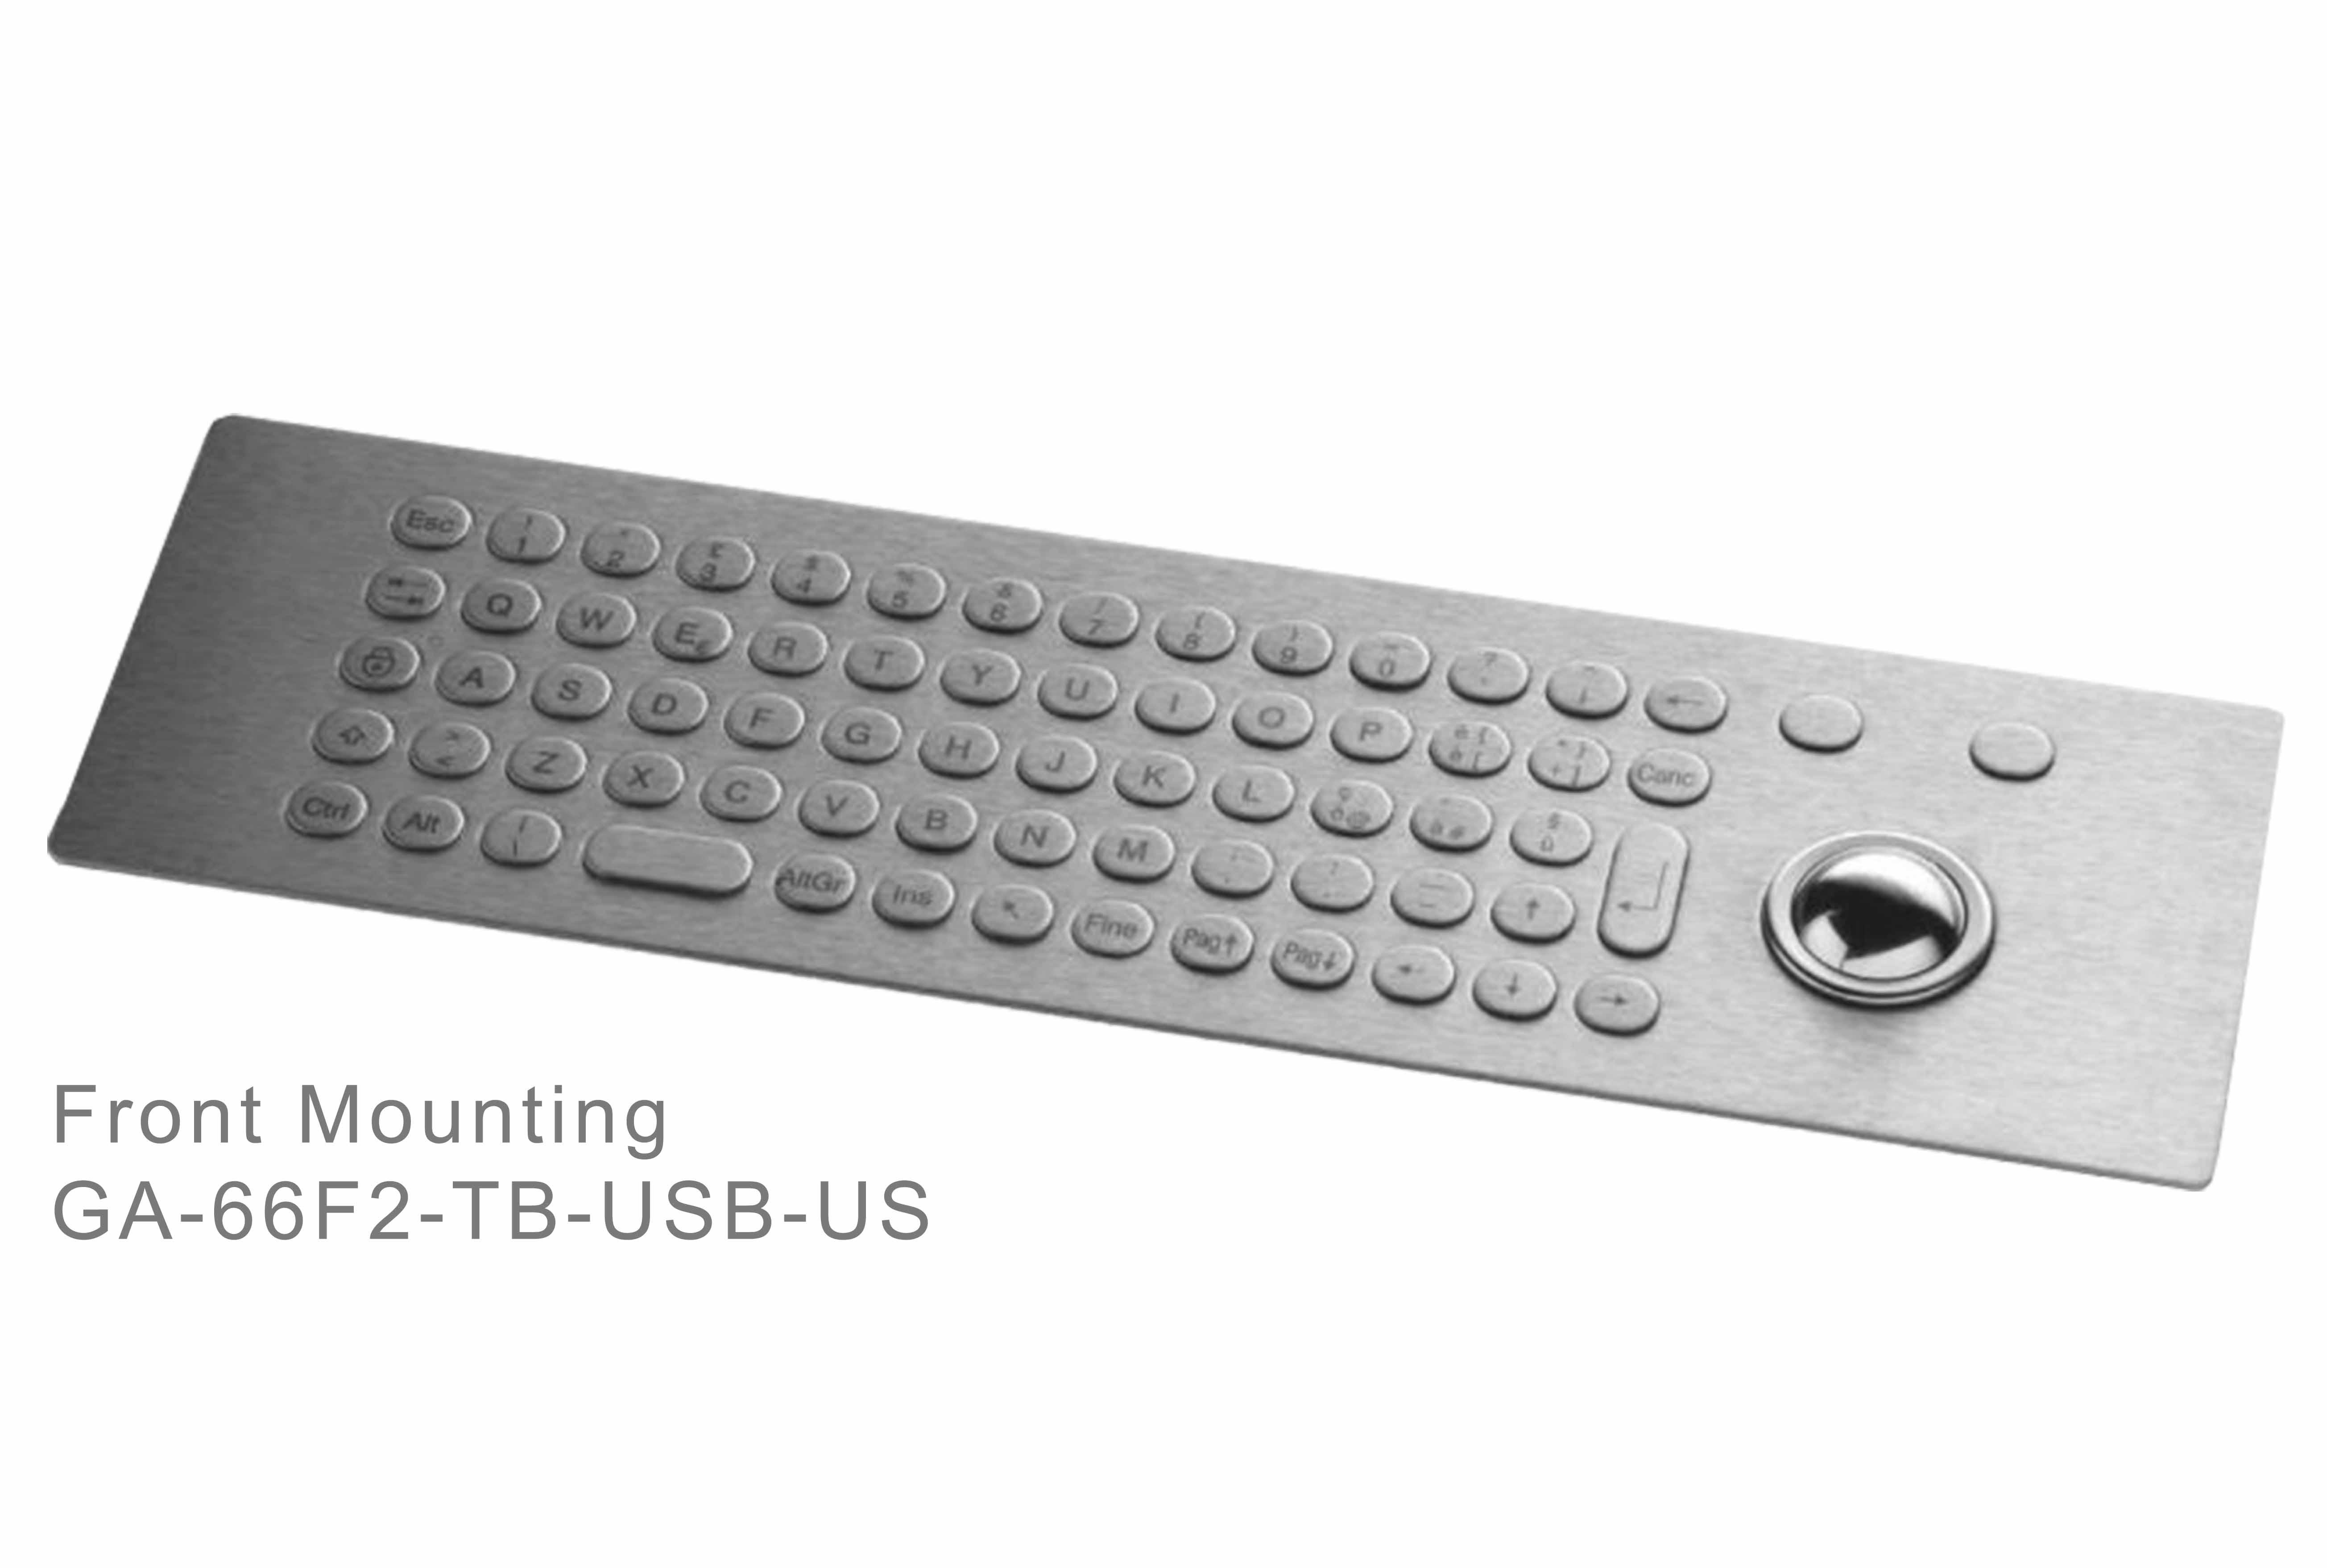 GA-Industrial-Italian Brand-60+Keys Trackball Front Mounting-L